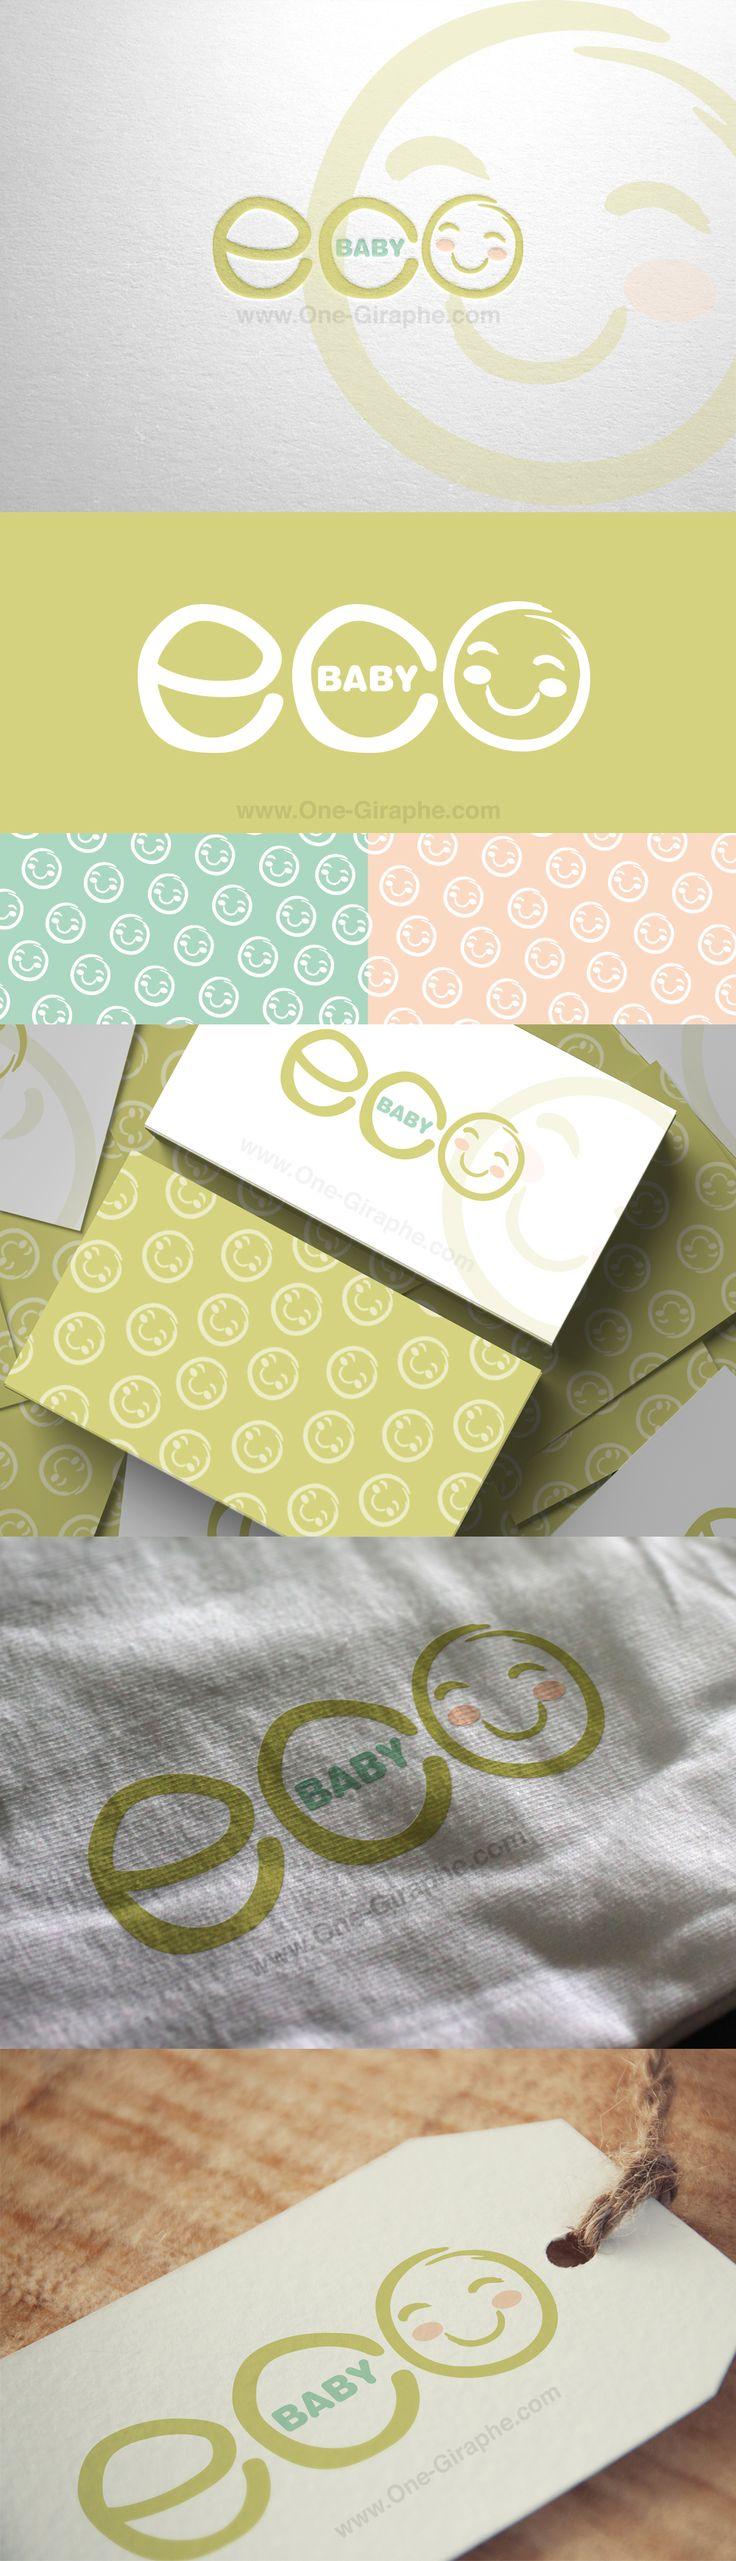 #baby #logo #design #children #kids #logodesign #eco #green #organic #brandidentity Portfolio http://one-giraphe.com/prev.php?c=113